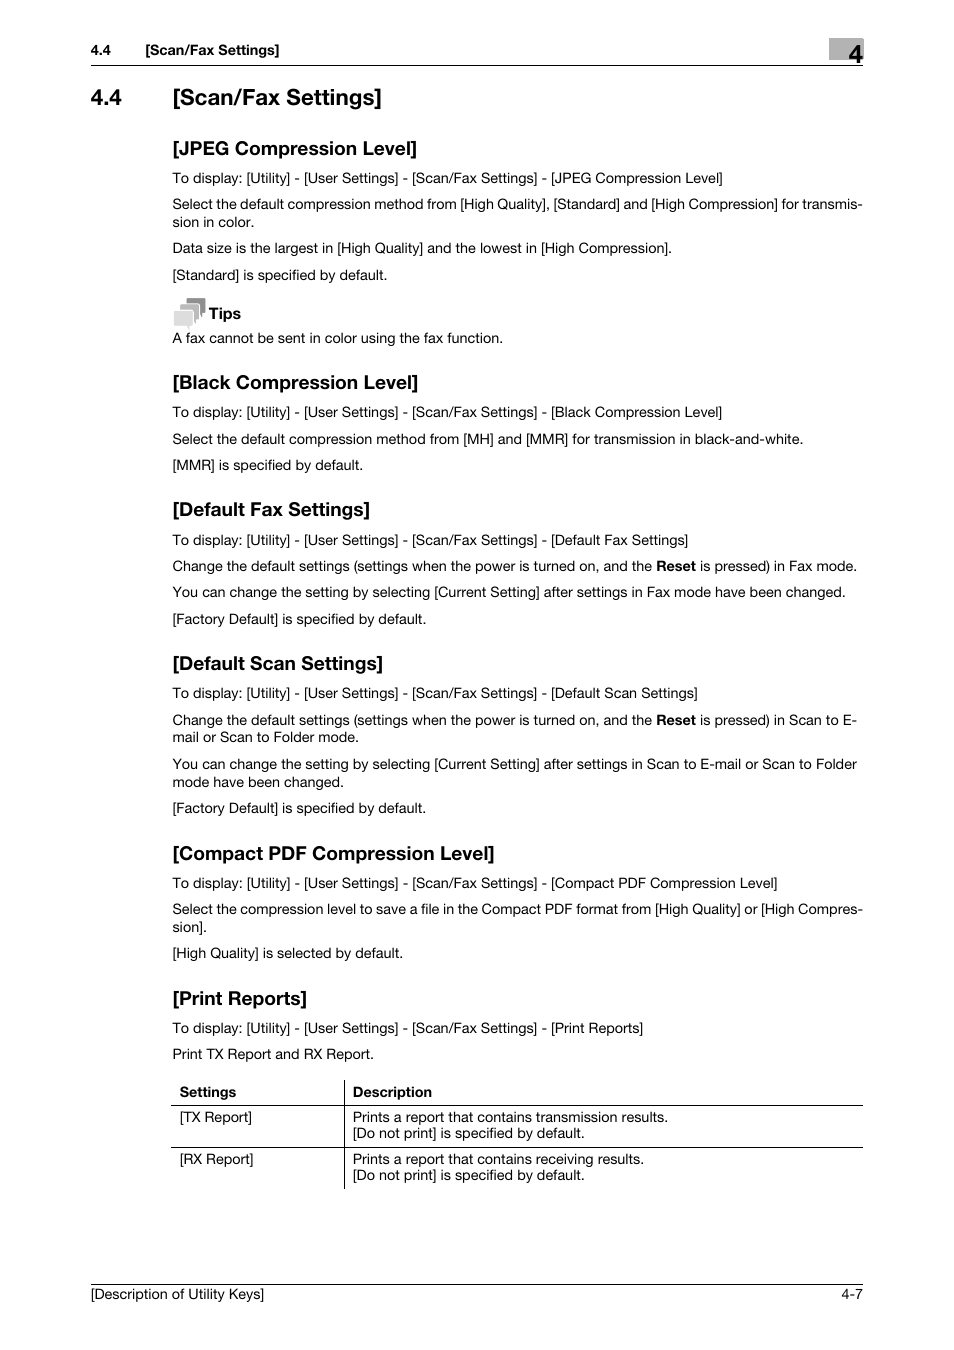 4 [scan/fax settings, Jpeg compression level, Black